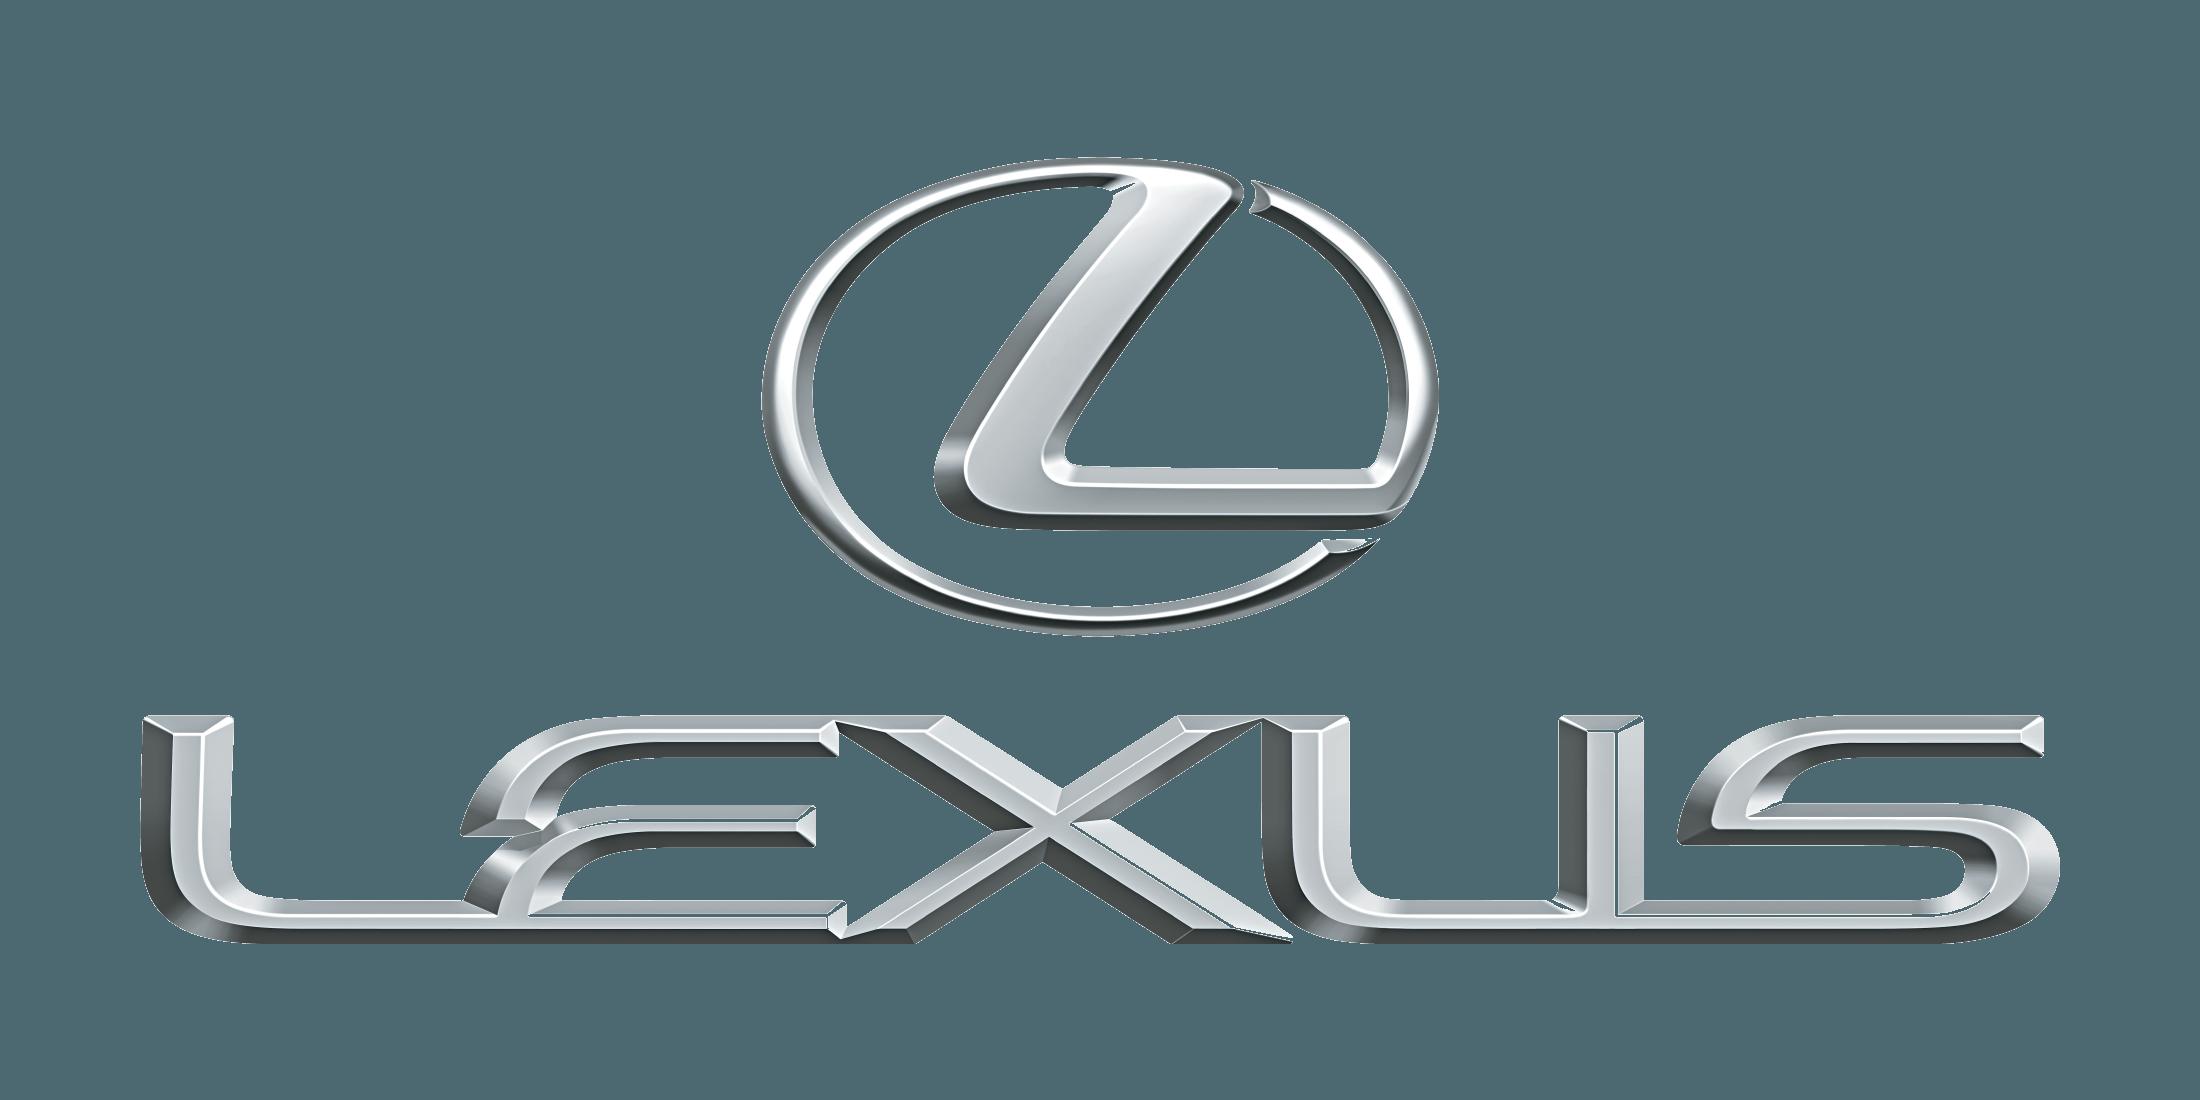 Download Png Image   Lexus Car Logo Png Brand Image - Car, Transparent background PNG HD thumbnail